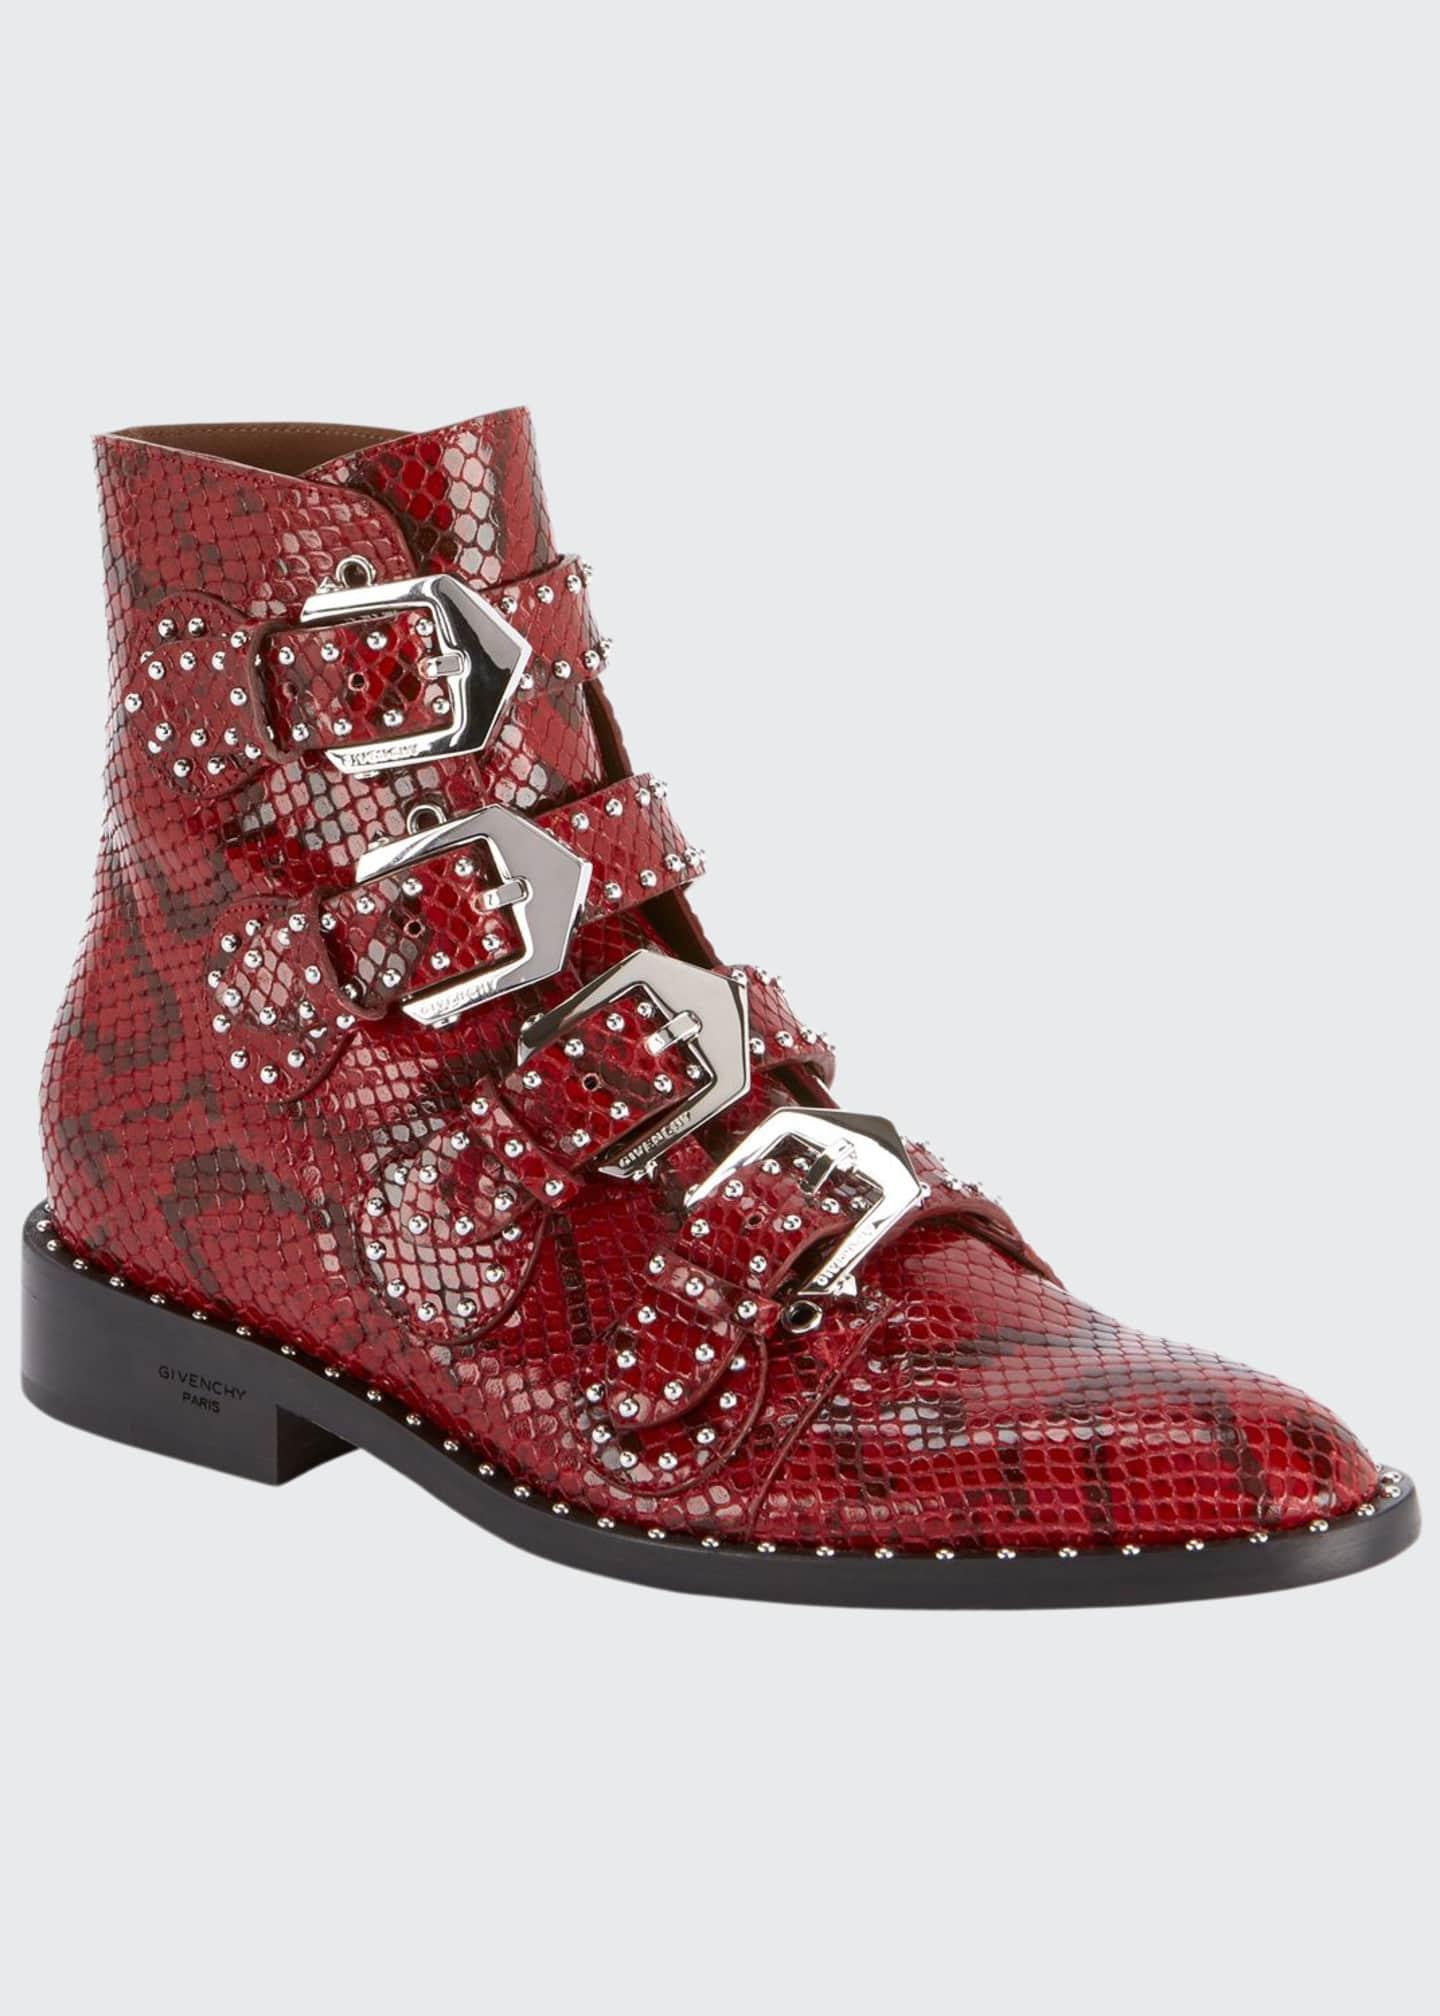 Givenchy Elegant Studded Python-Print Booties